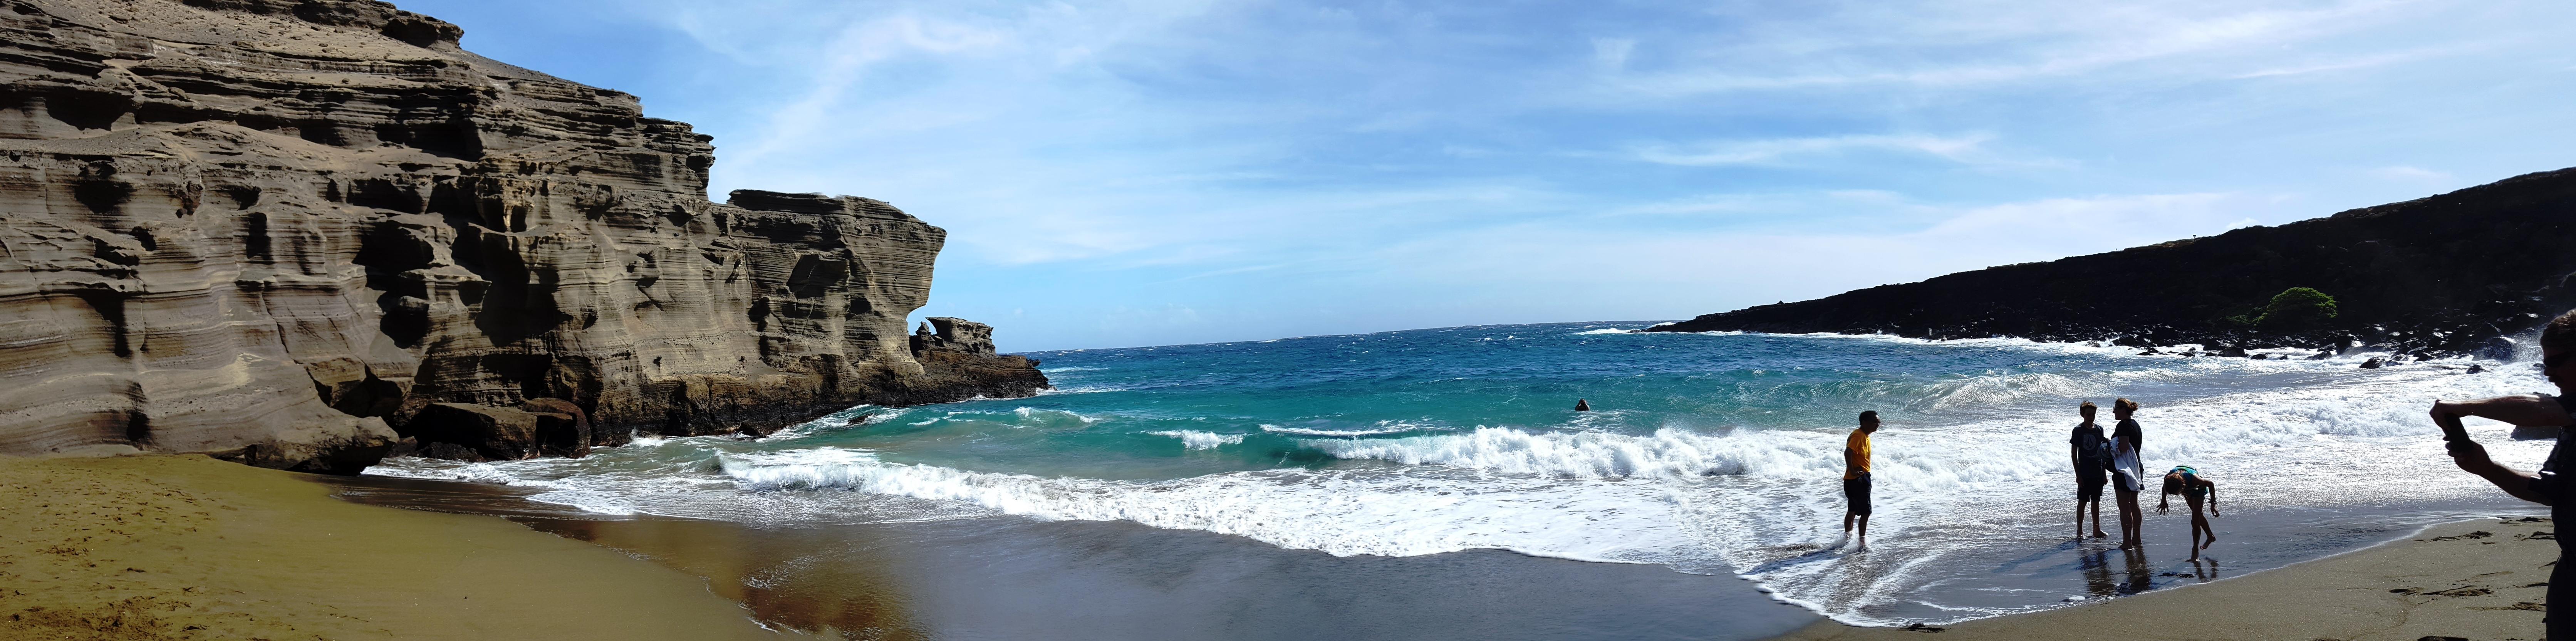 Best Boogie Boarding Beaches Big Island